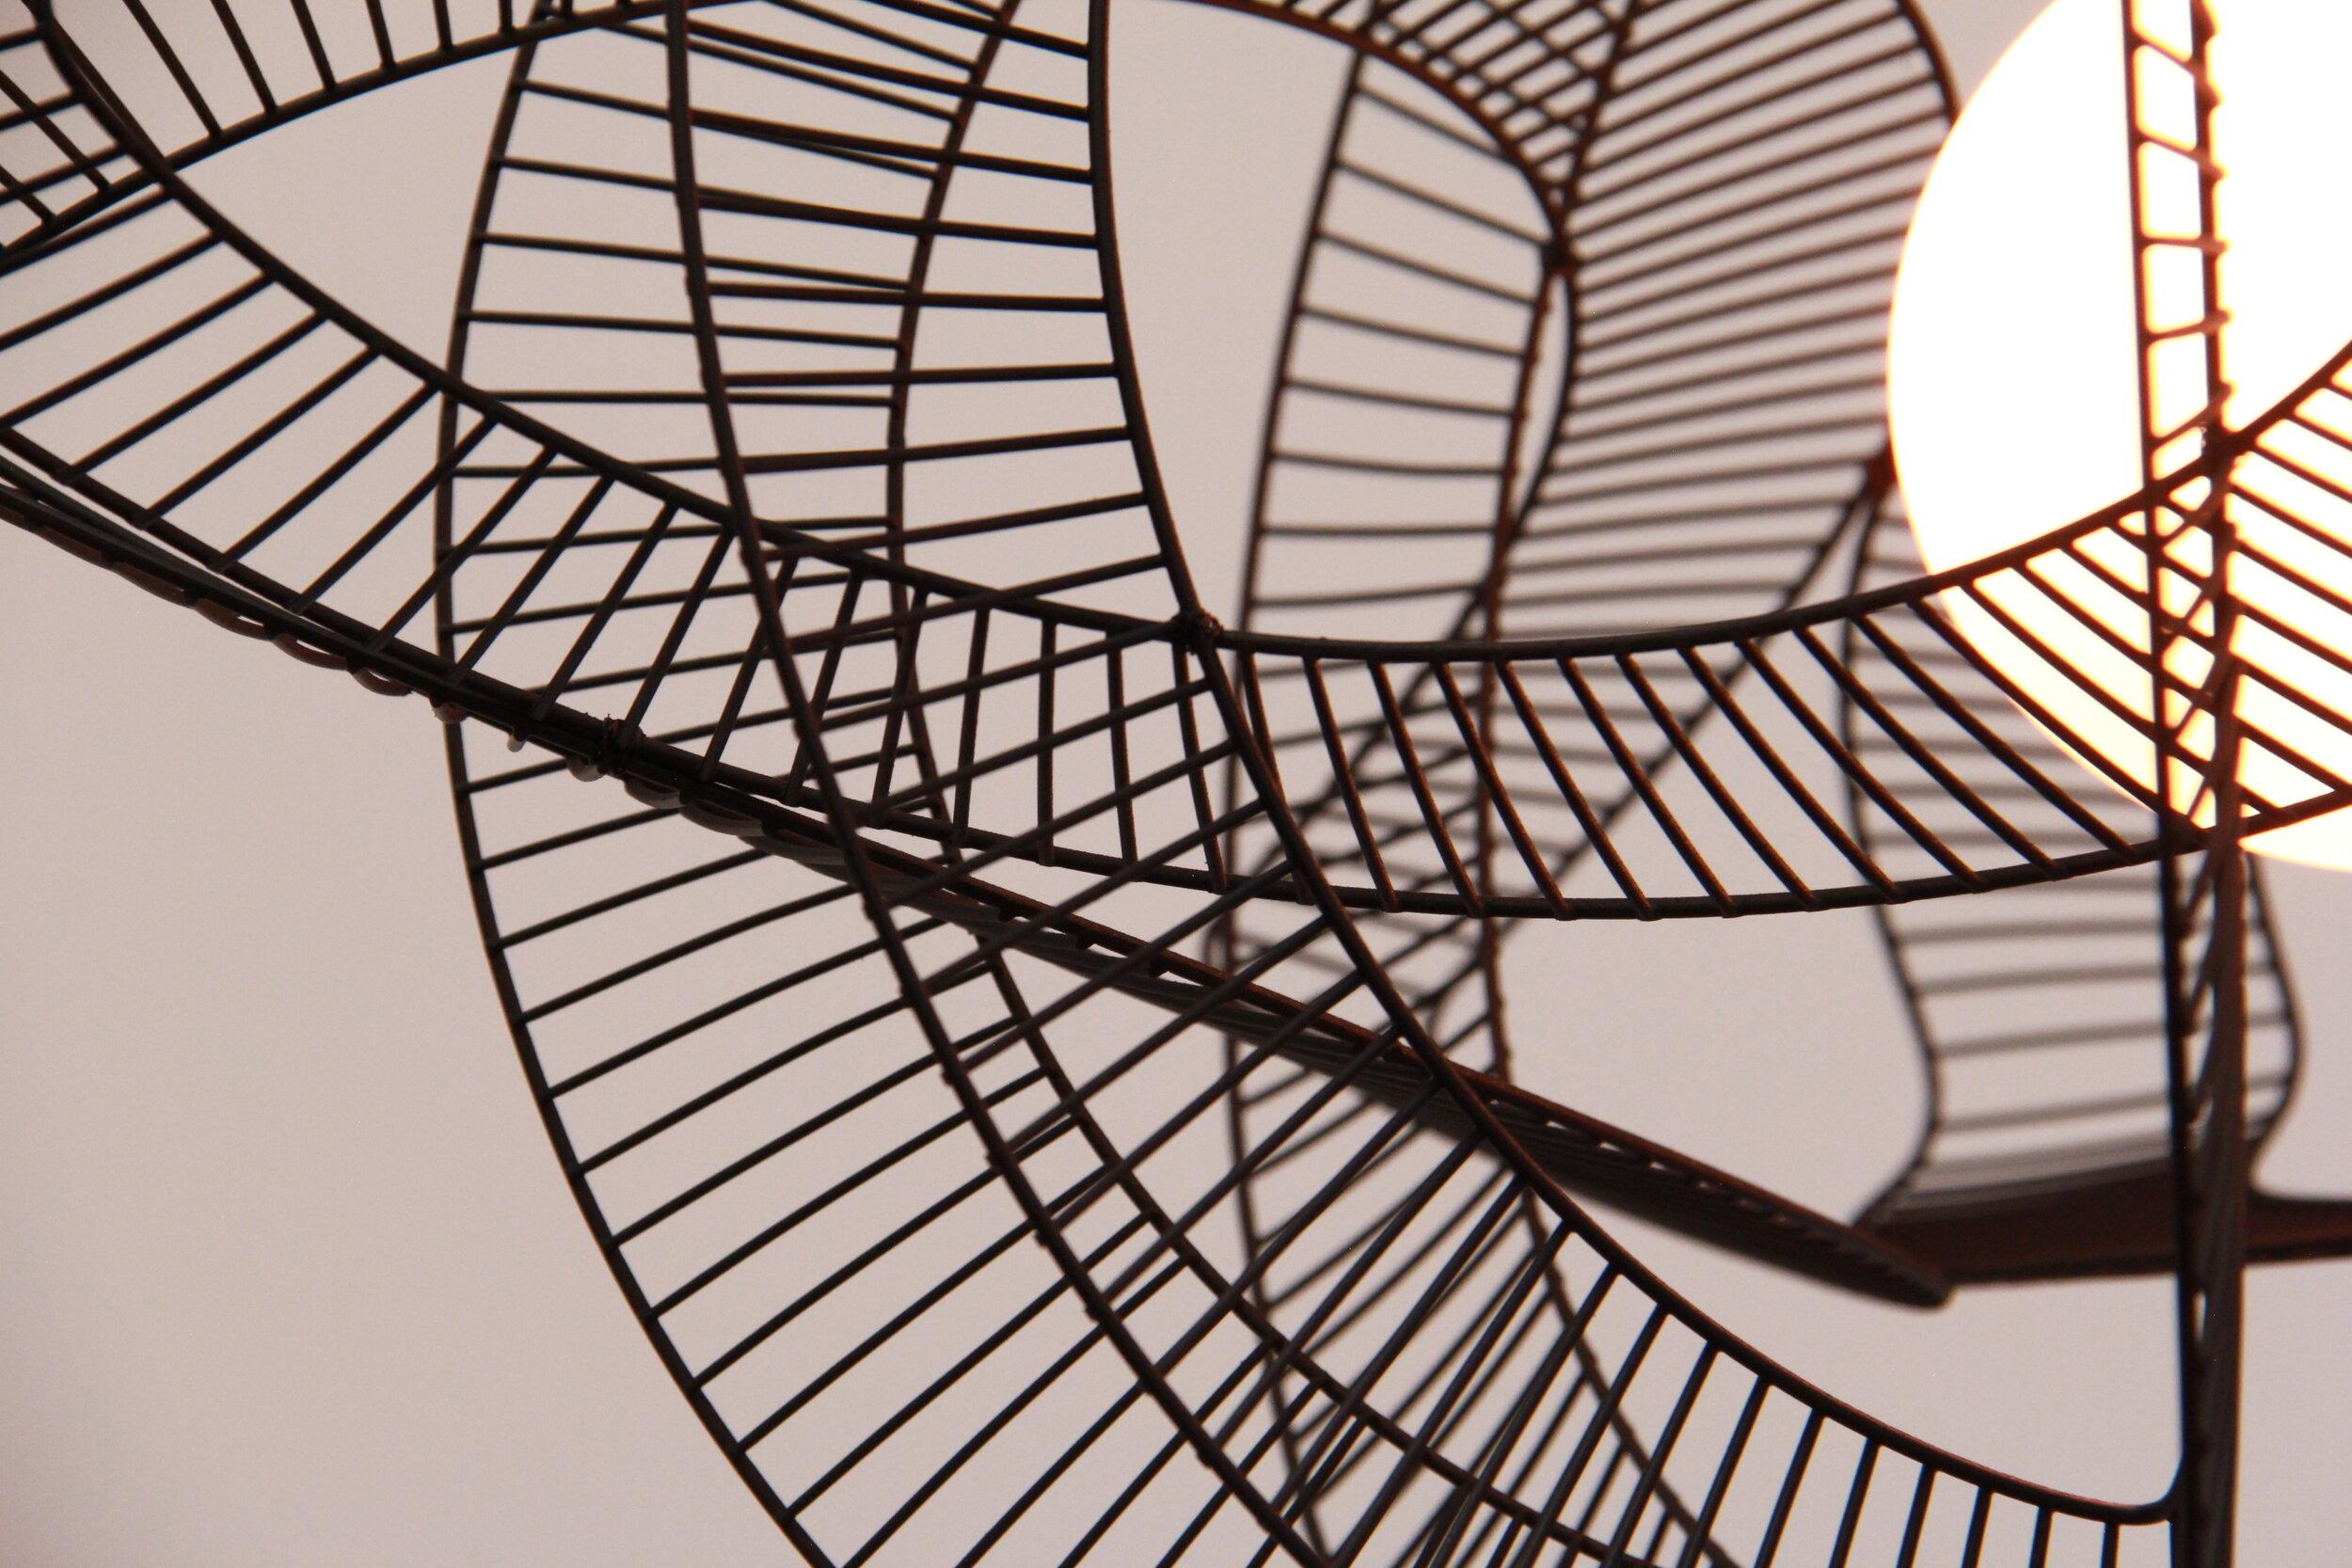 Olas_Sphera_black_brass_luminaire_design_lampe_lamp_studio-botte_pendant 5.JPG